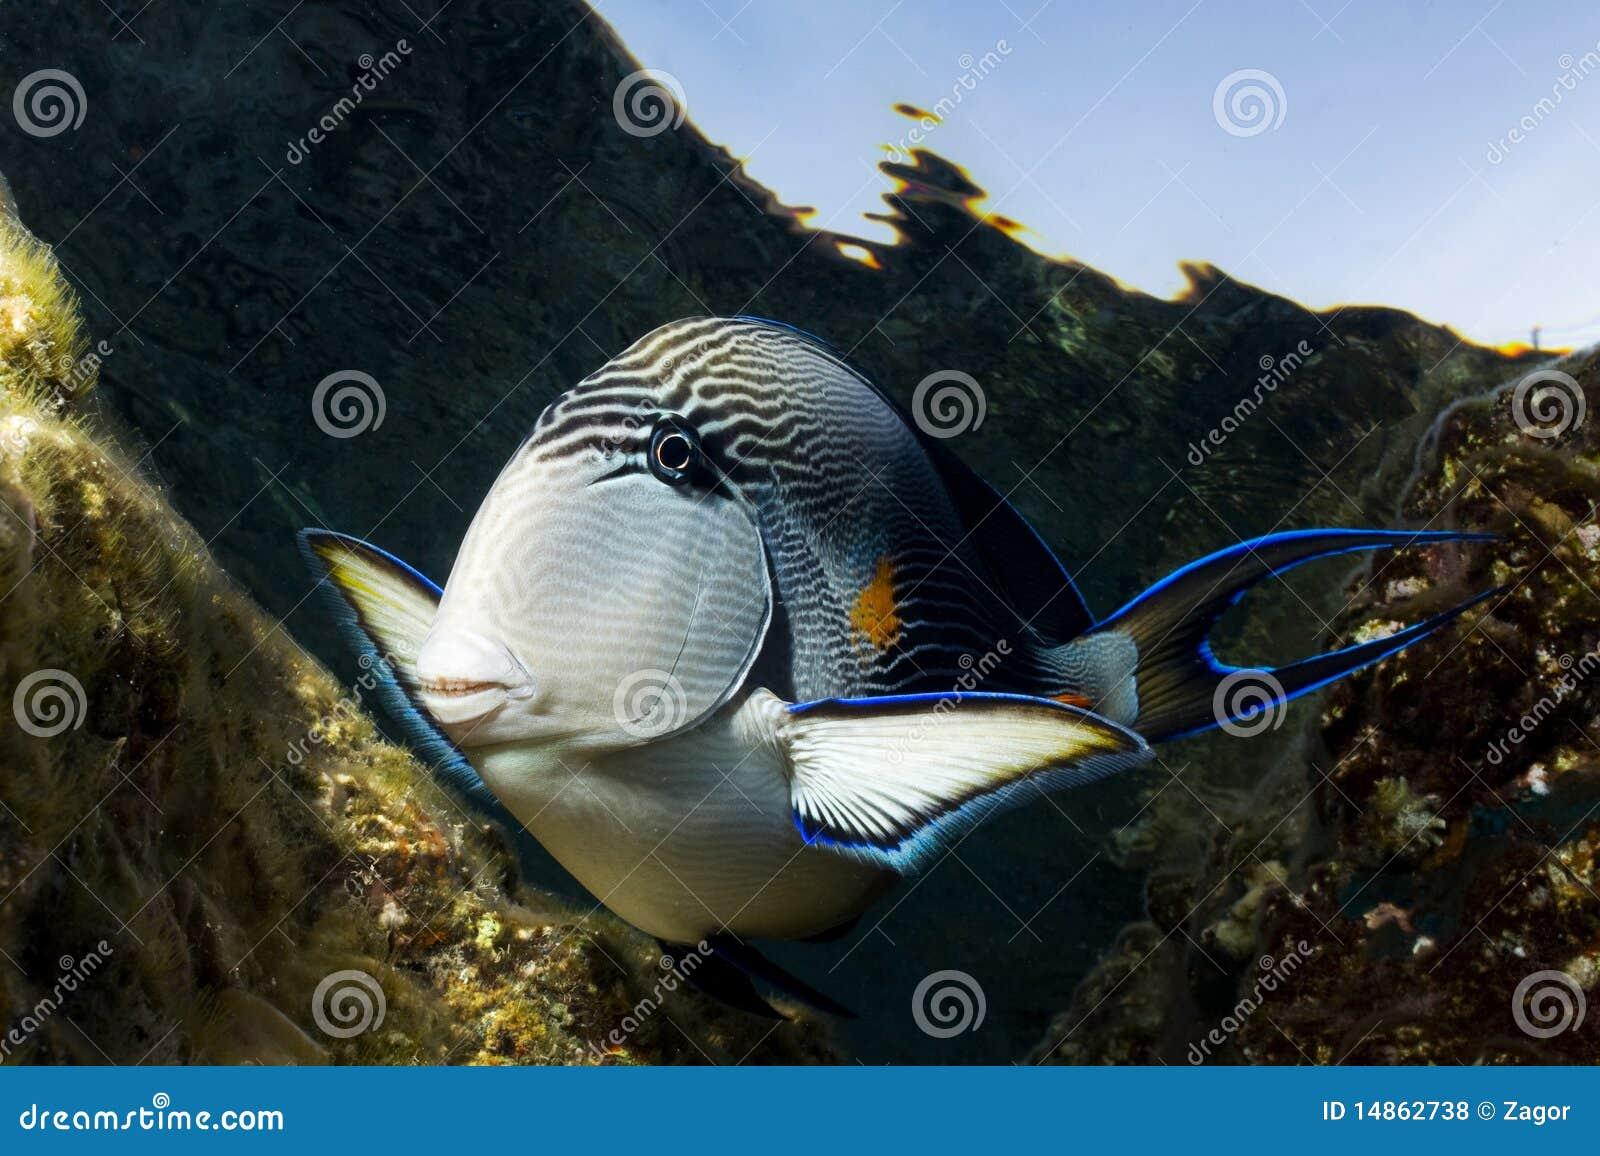 Curious tropical fish